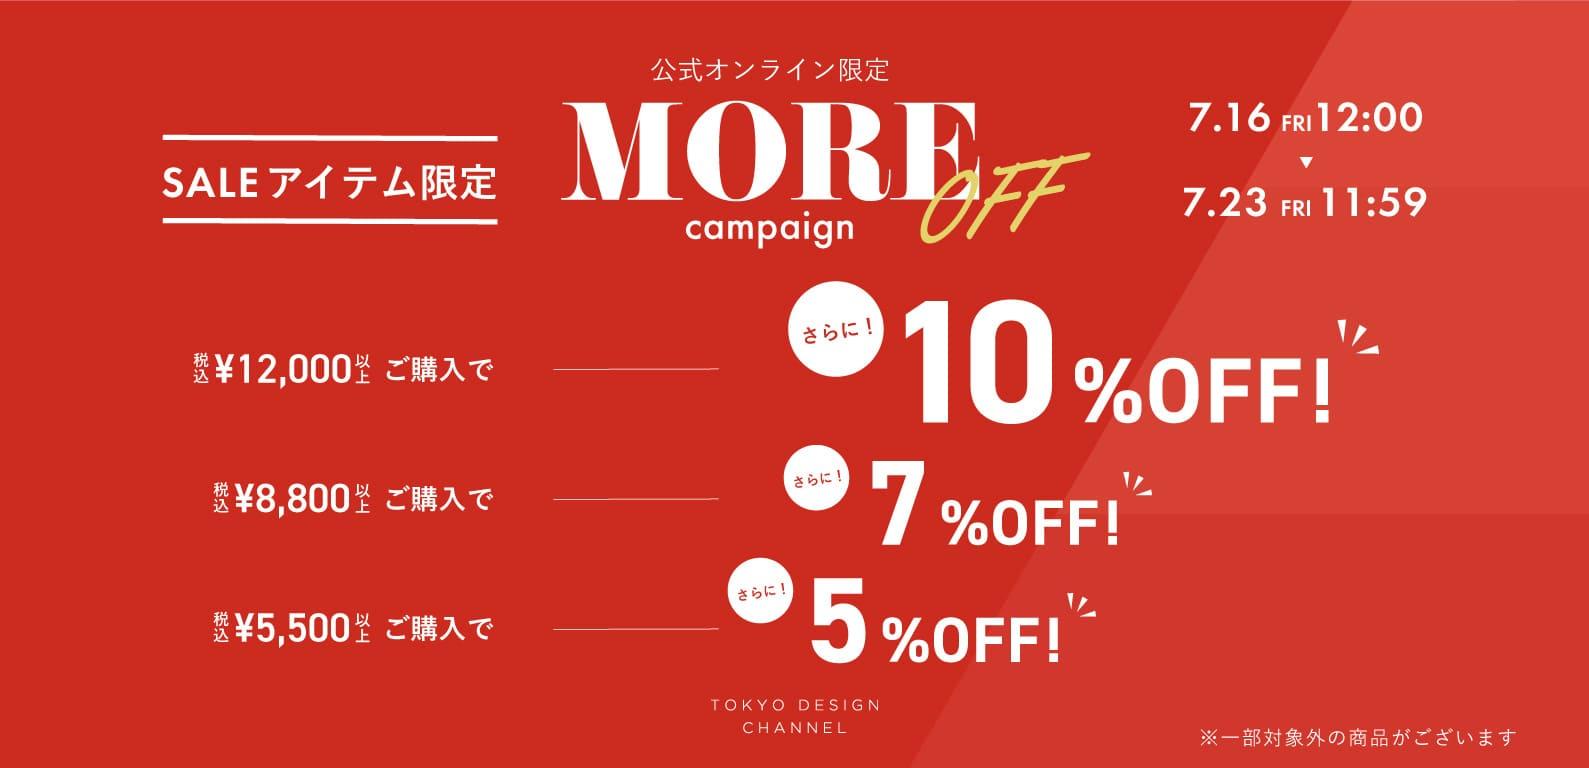 TDC | MORE OFF キャンペーン SALE